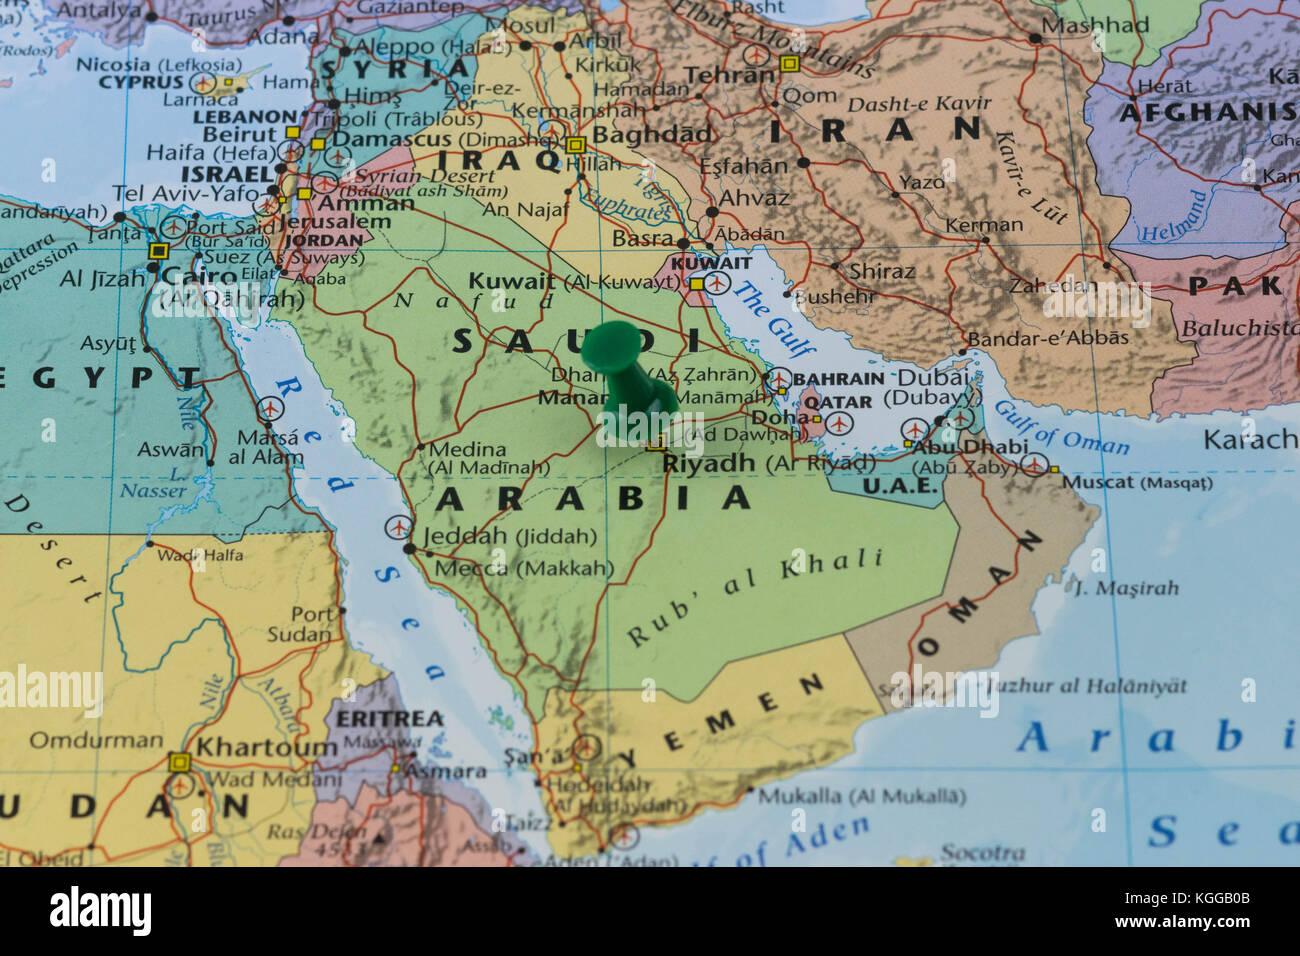 Riyadh pinned on a map of Saudi Arabia with a green pin, color of Saudi flag. - Stock Image